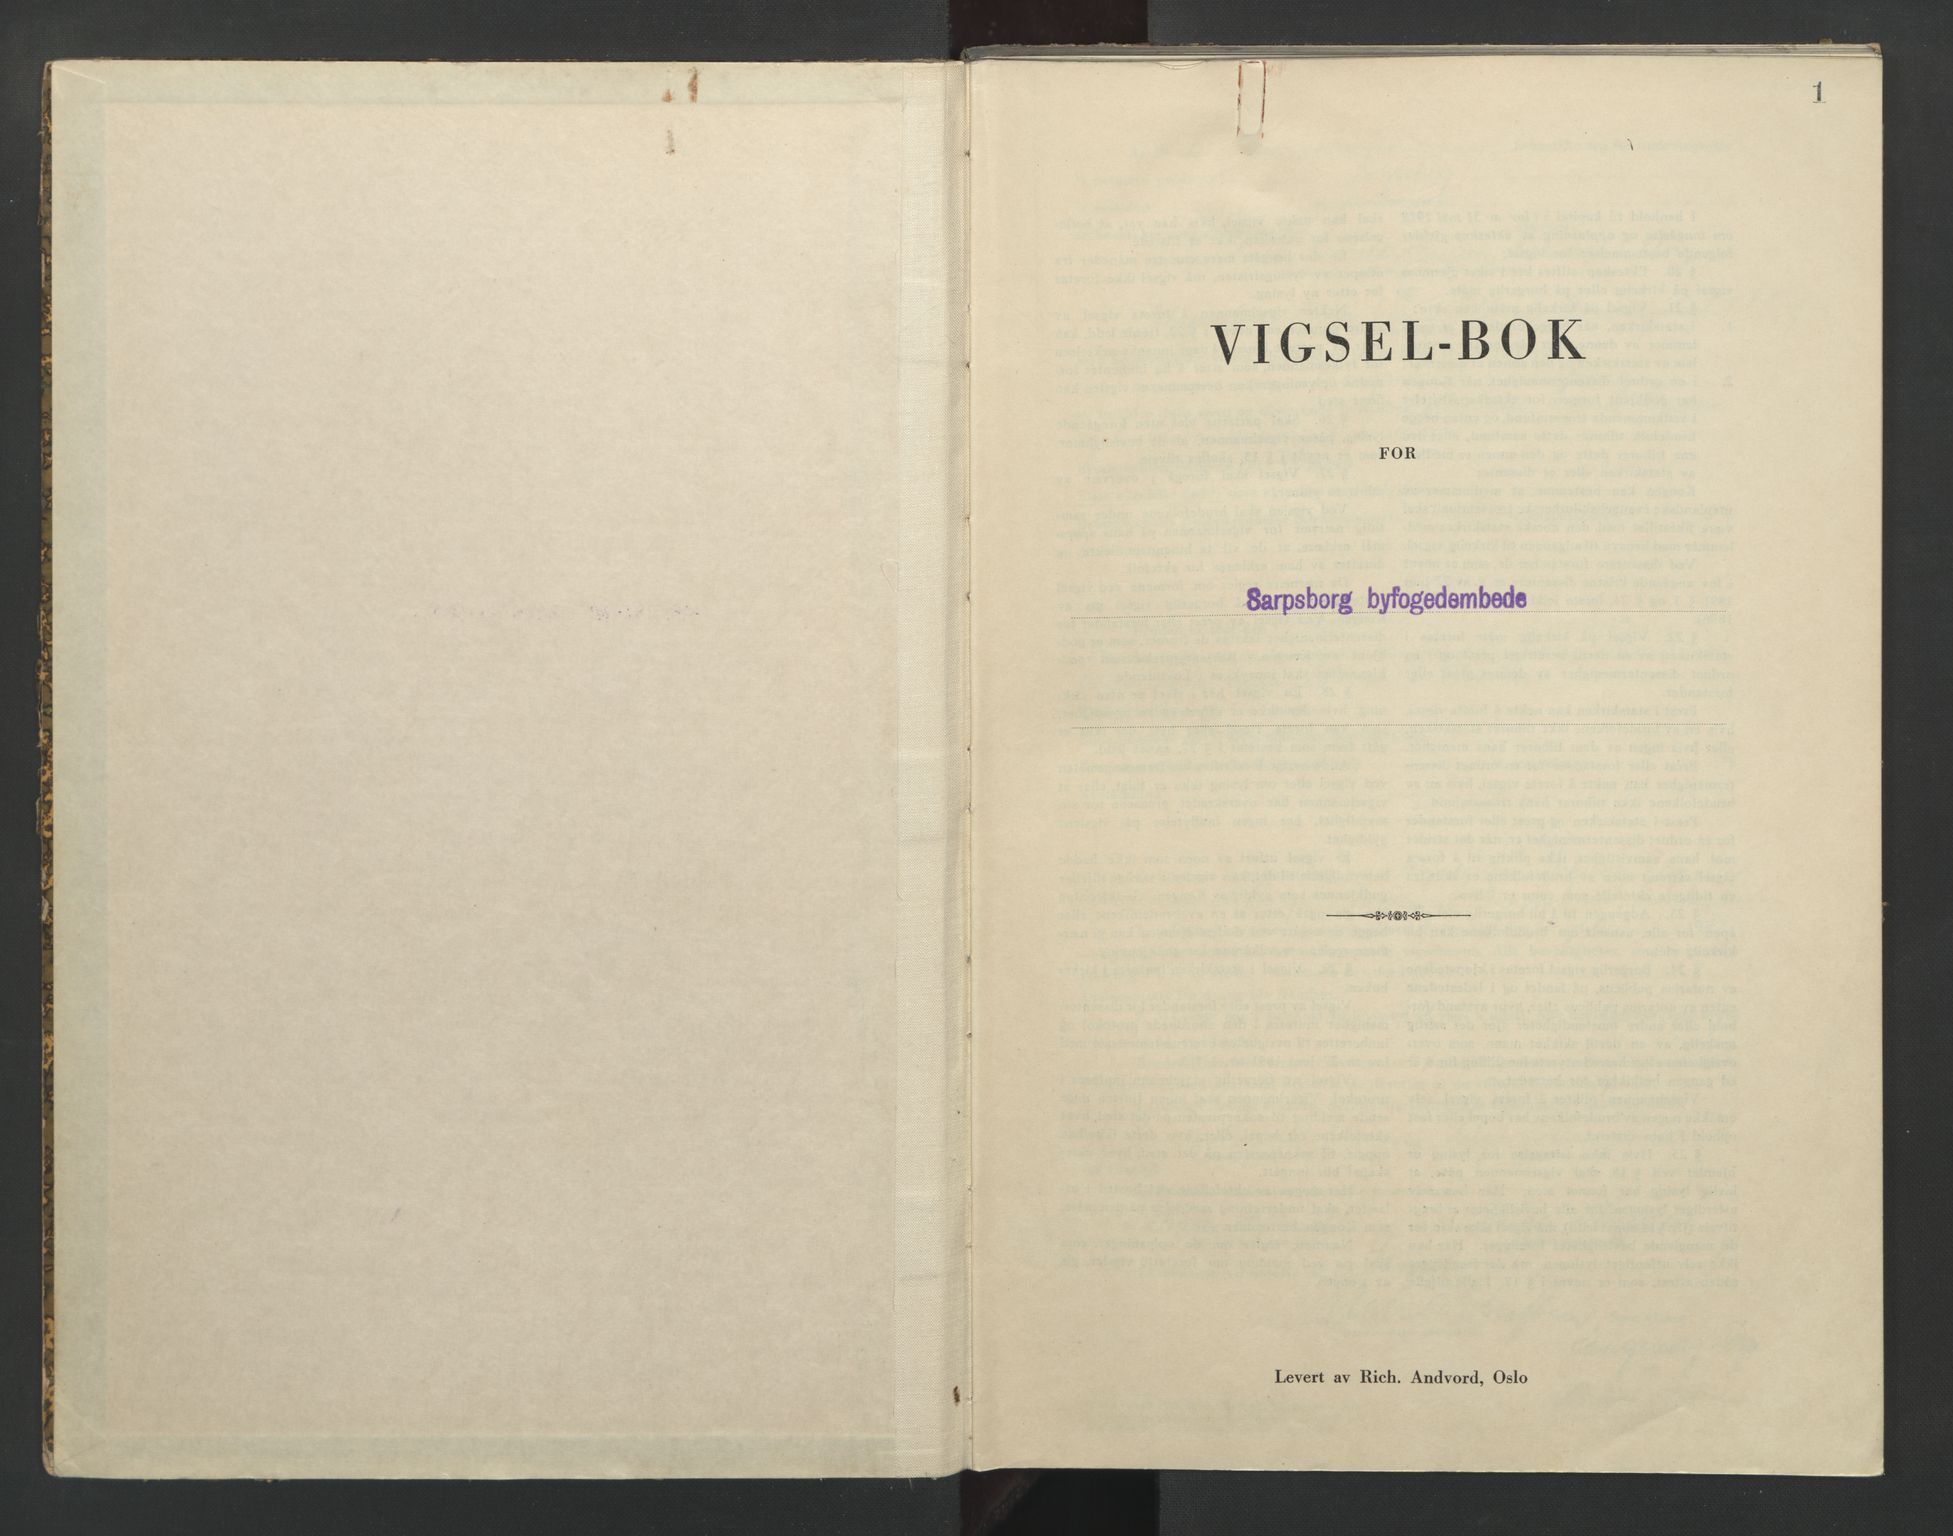 SAO, Sarpsborg byfogd, L/Lb/Lba/L0003: Vigselbok, 1943-1945, s. 1